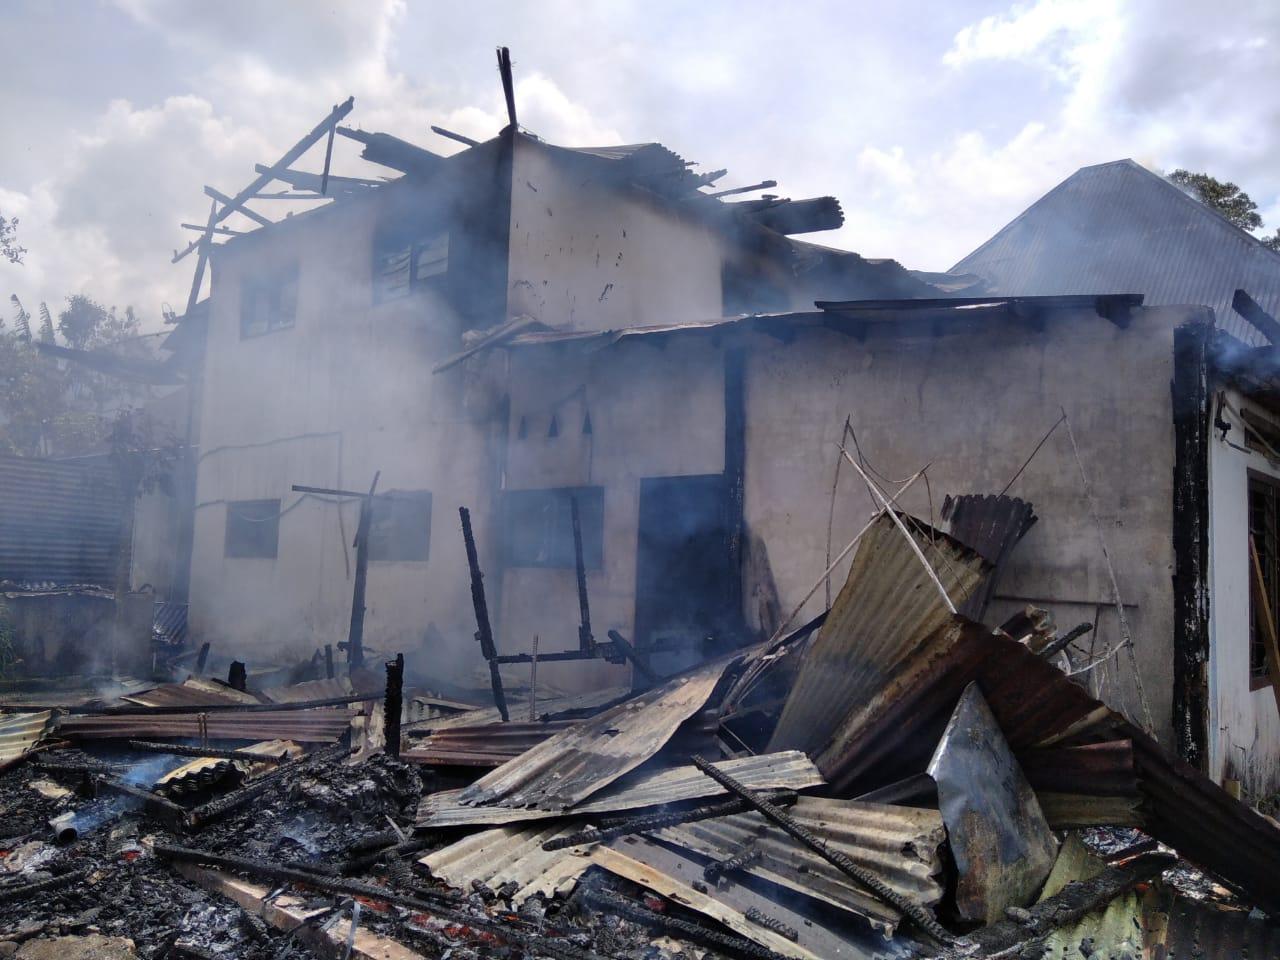 Kebakaran Rumah di jorong Baso Nagari Tabek Panjang Kec. Baso